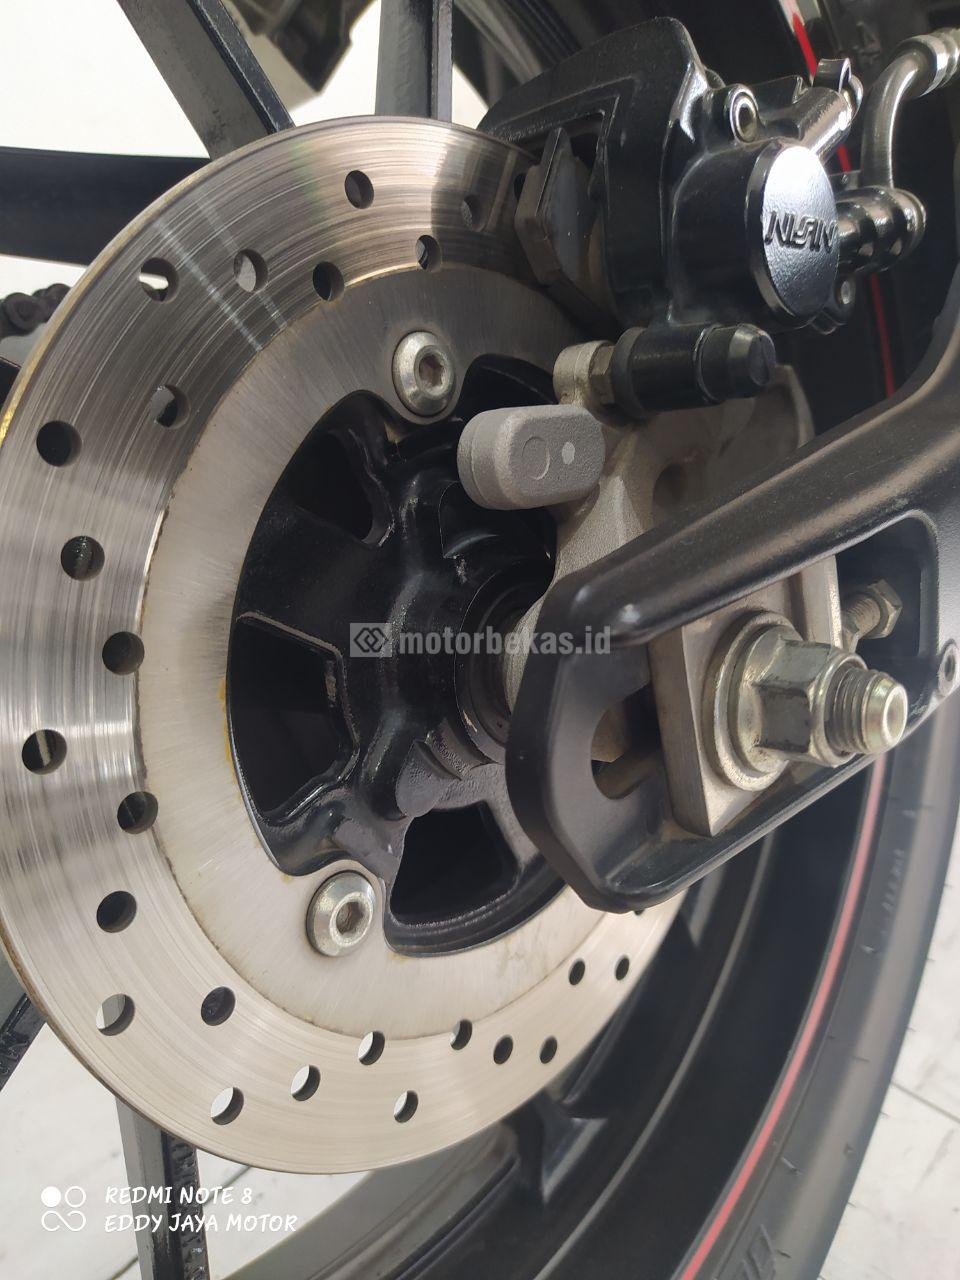 YAMAHA R15 155  1637 motorbekas.id